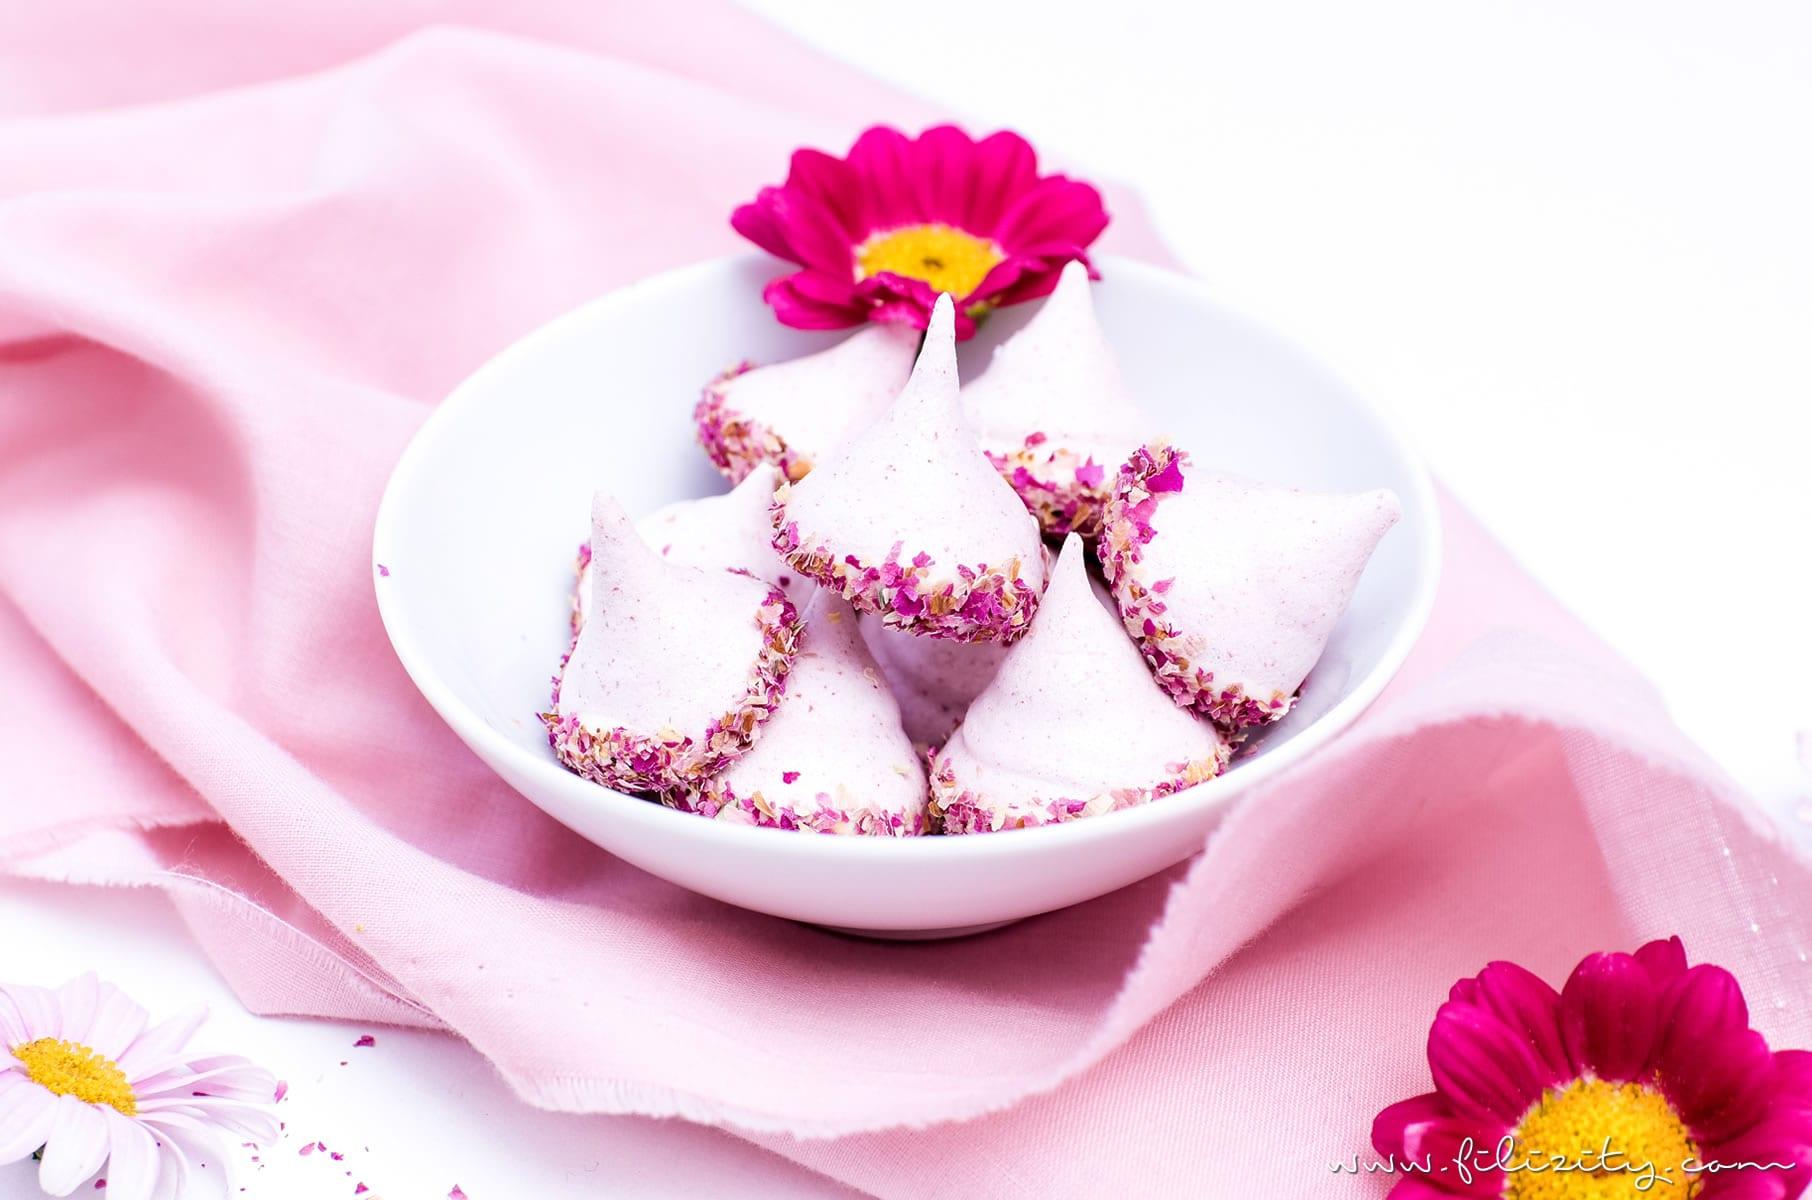 Beautiful Geschenke Aus Der Küche Rezepte Photos - Farbideen fürs ...